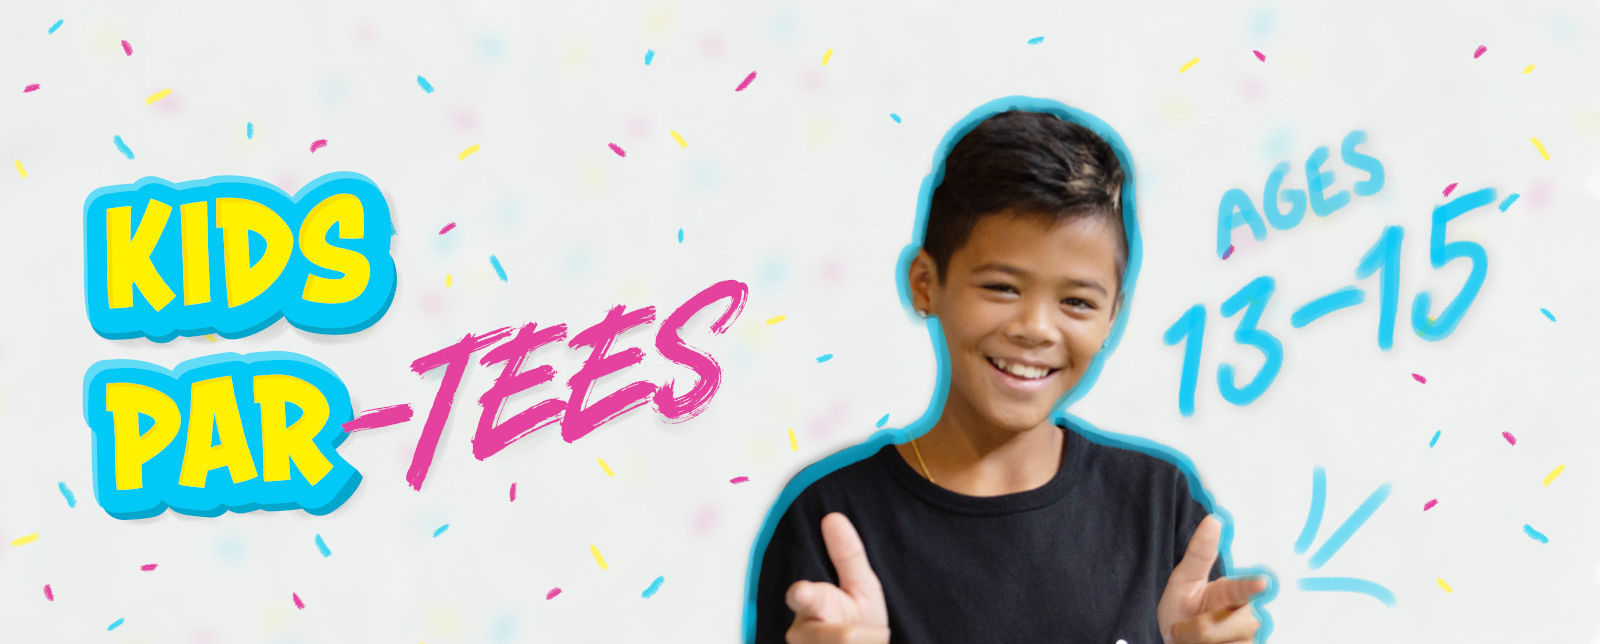 kidspartee-web-banner-TEENS